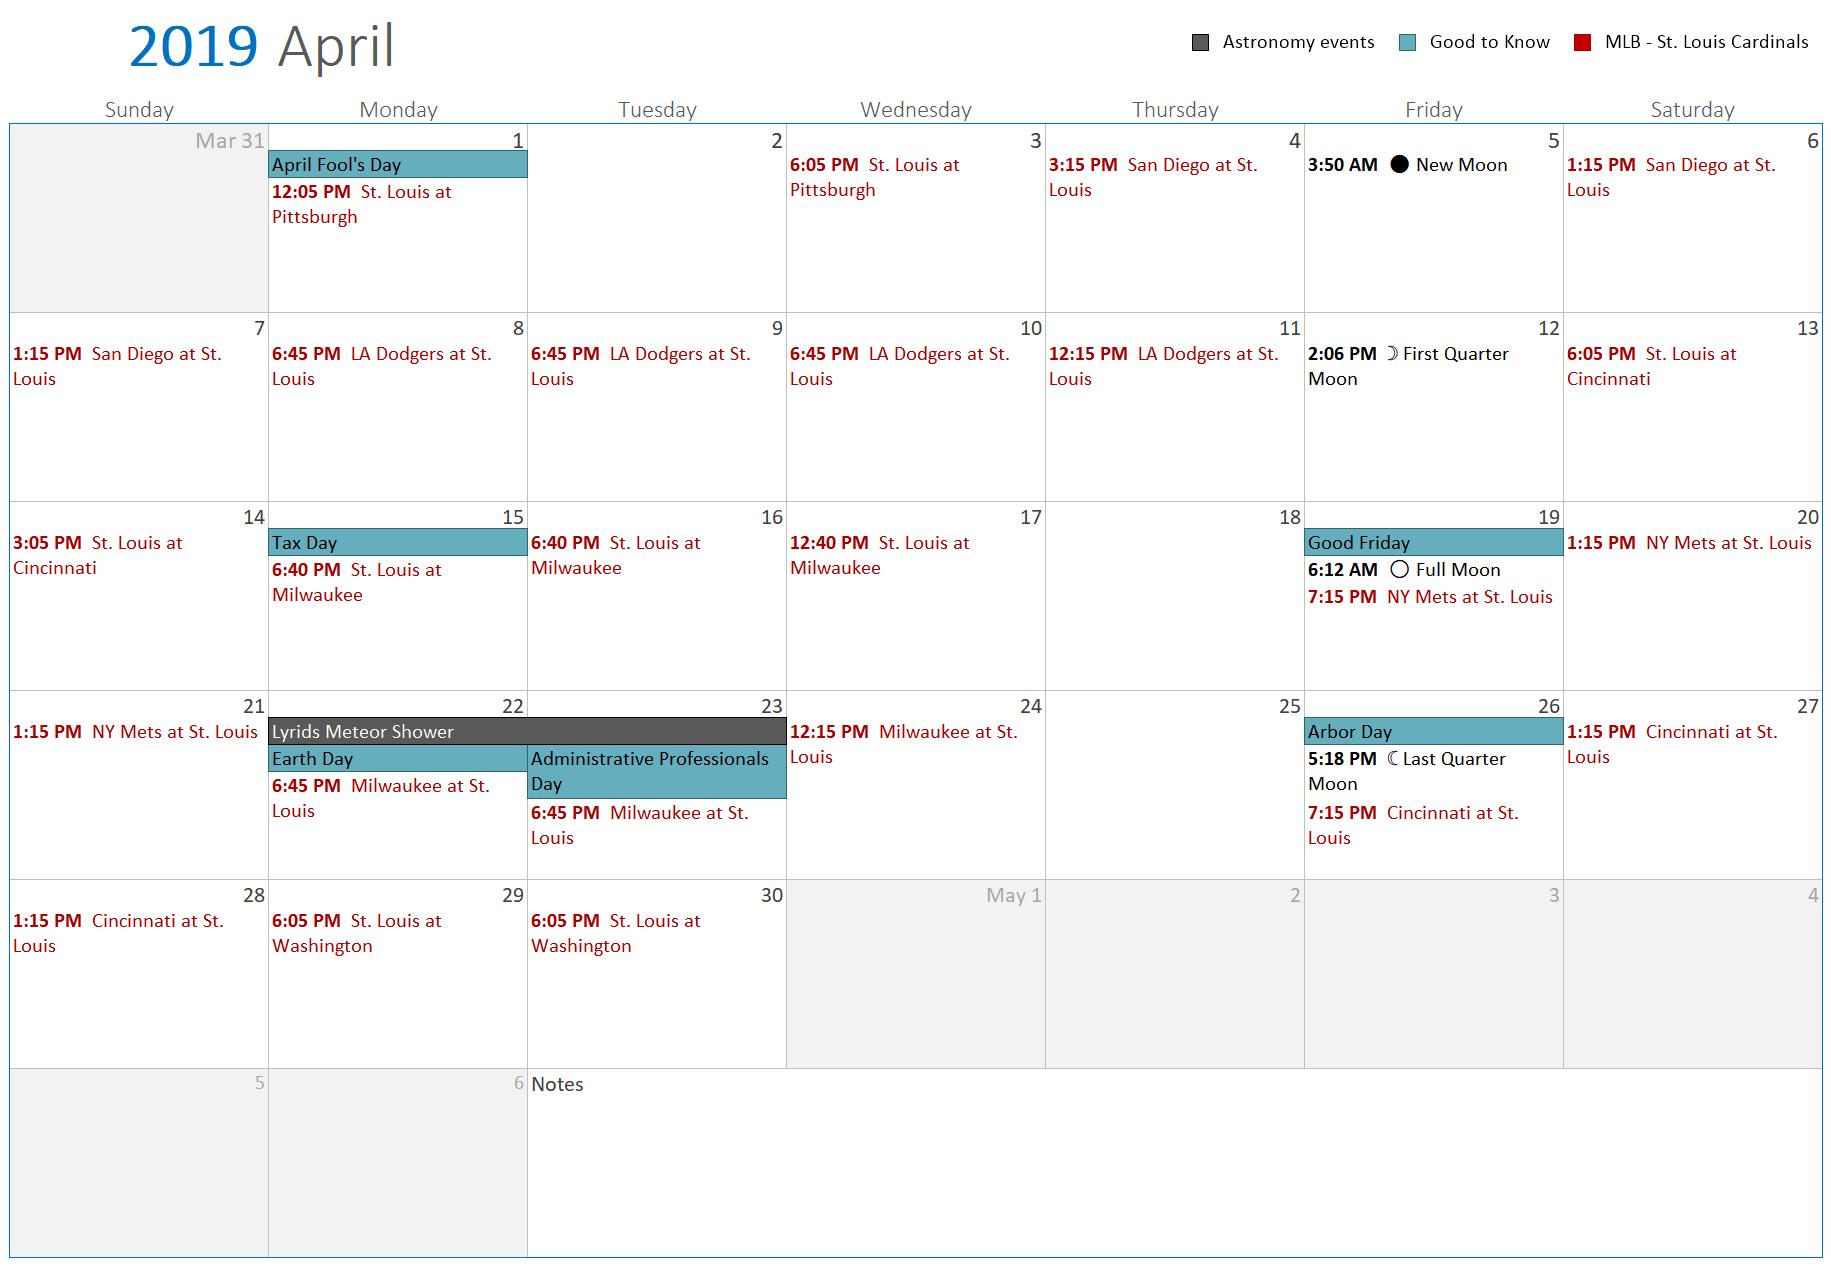 Printablecal | Create Printable Calendars With 60+ Free